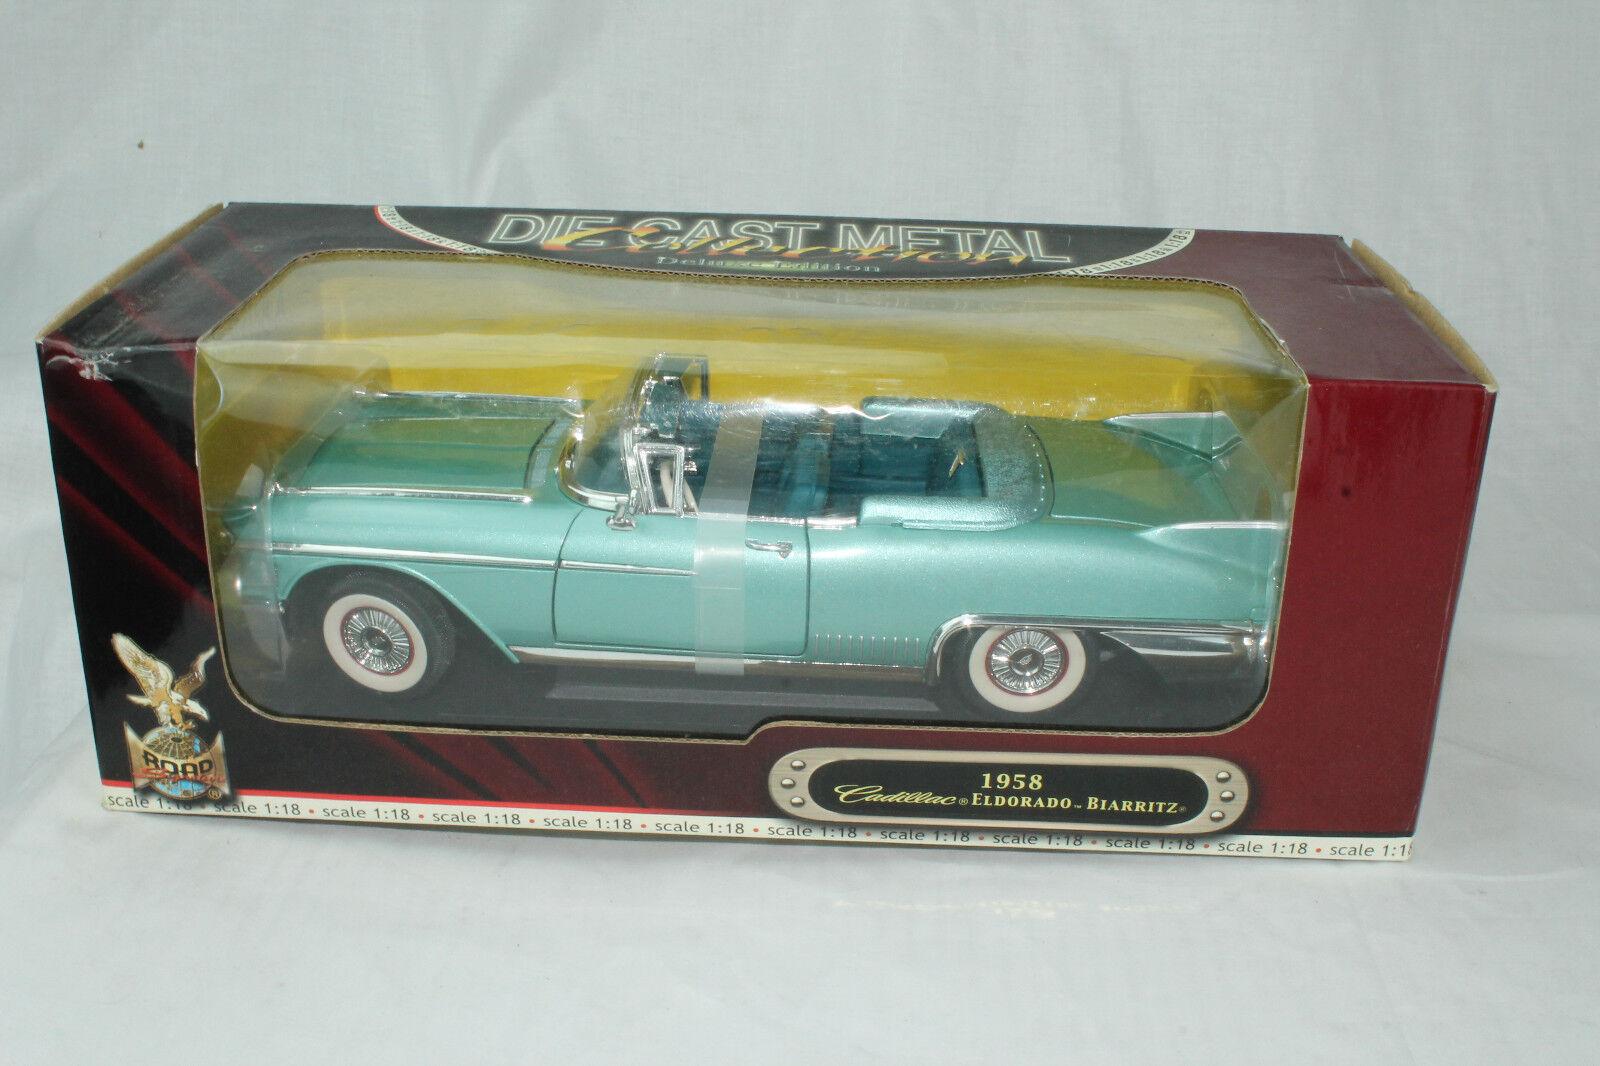 Strada Segno Distintivo Modelli 1958 Cadillac Eldorado Biarritz, Verde, 1:18,